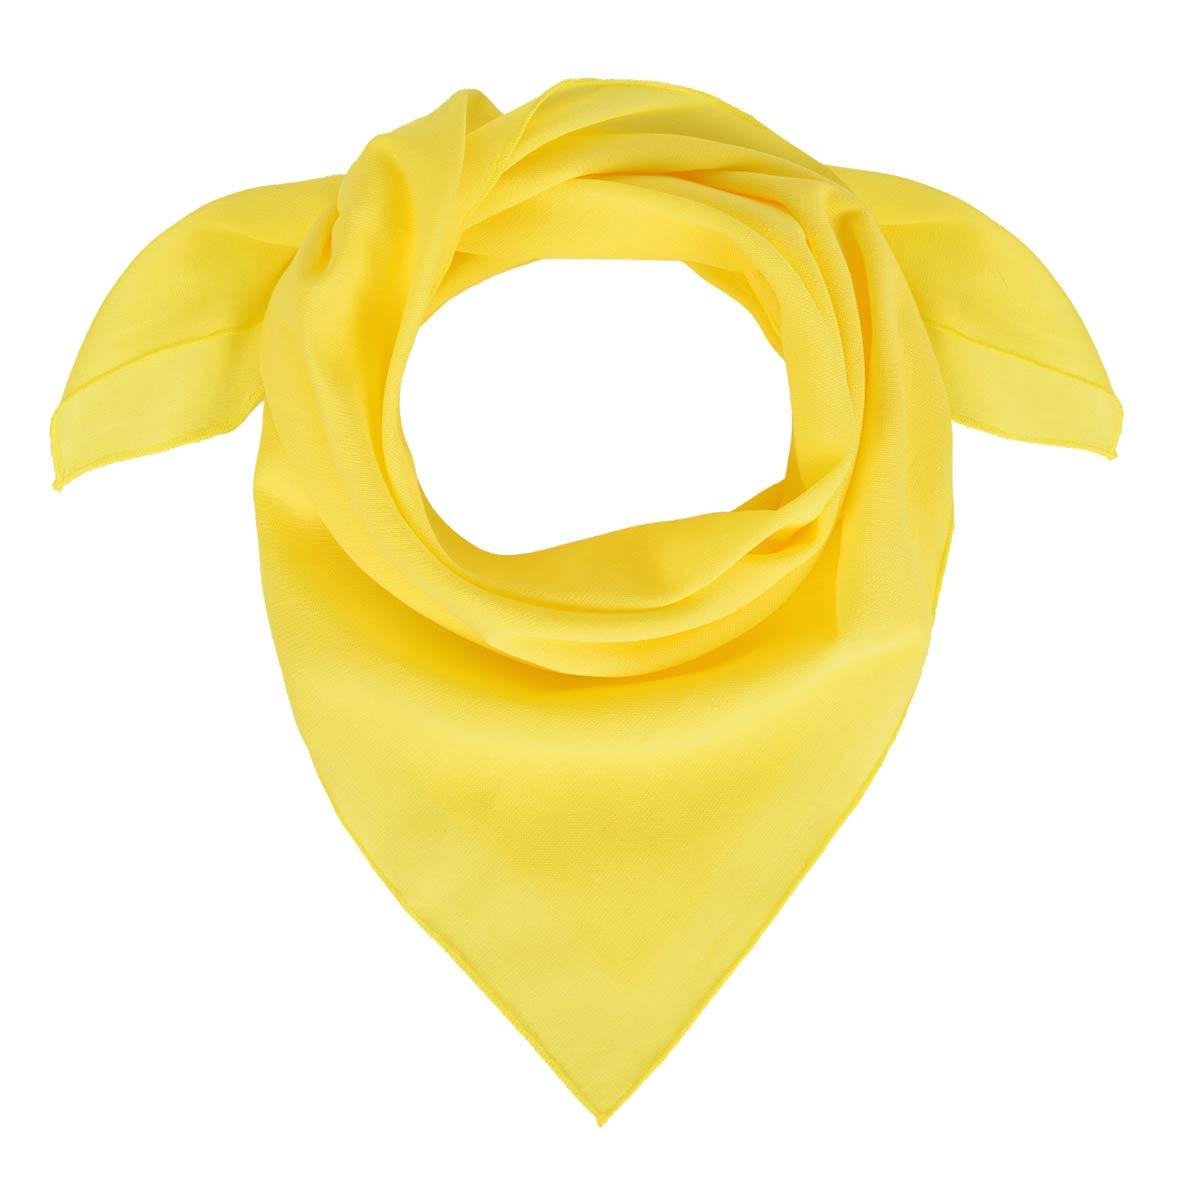 AT-04913_F12-1--_Bandana-jaune